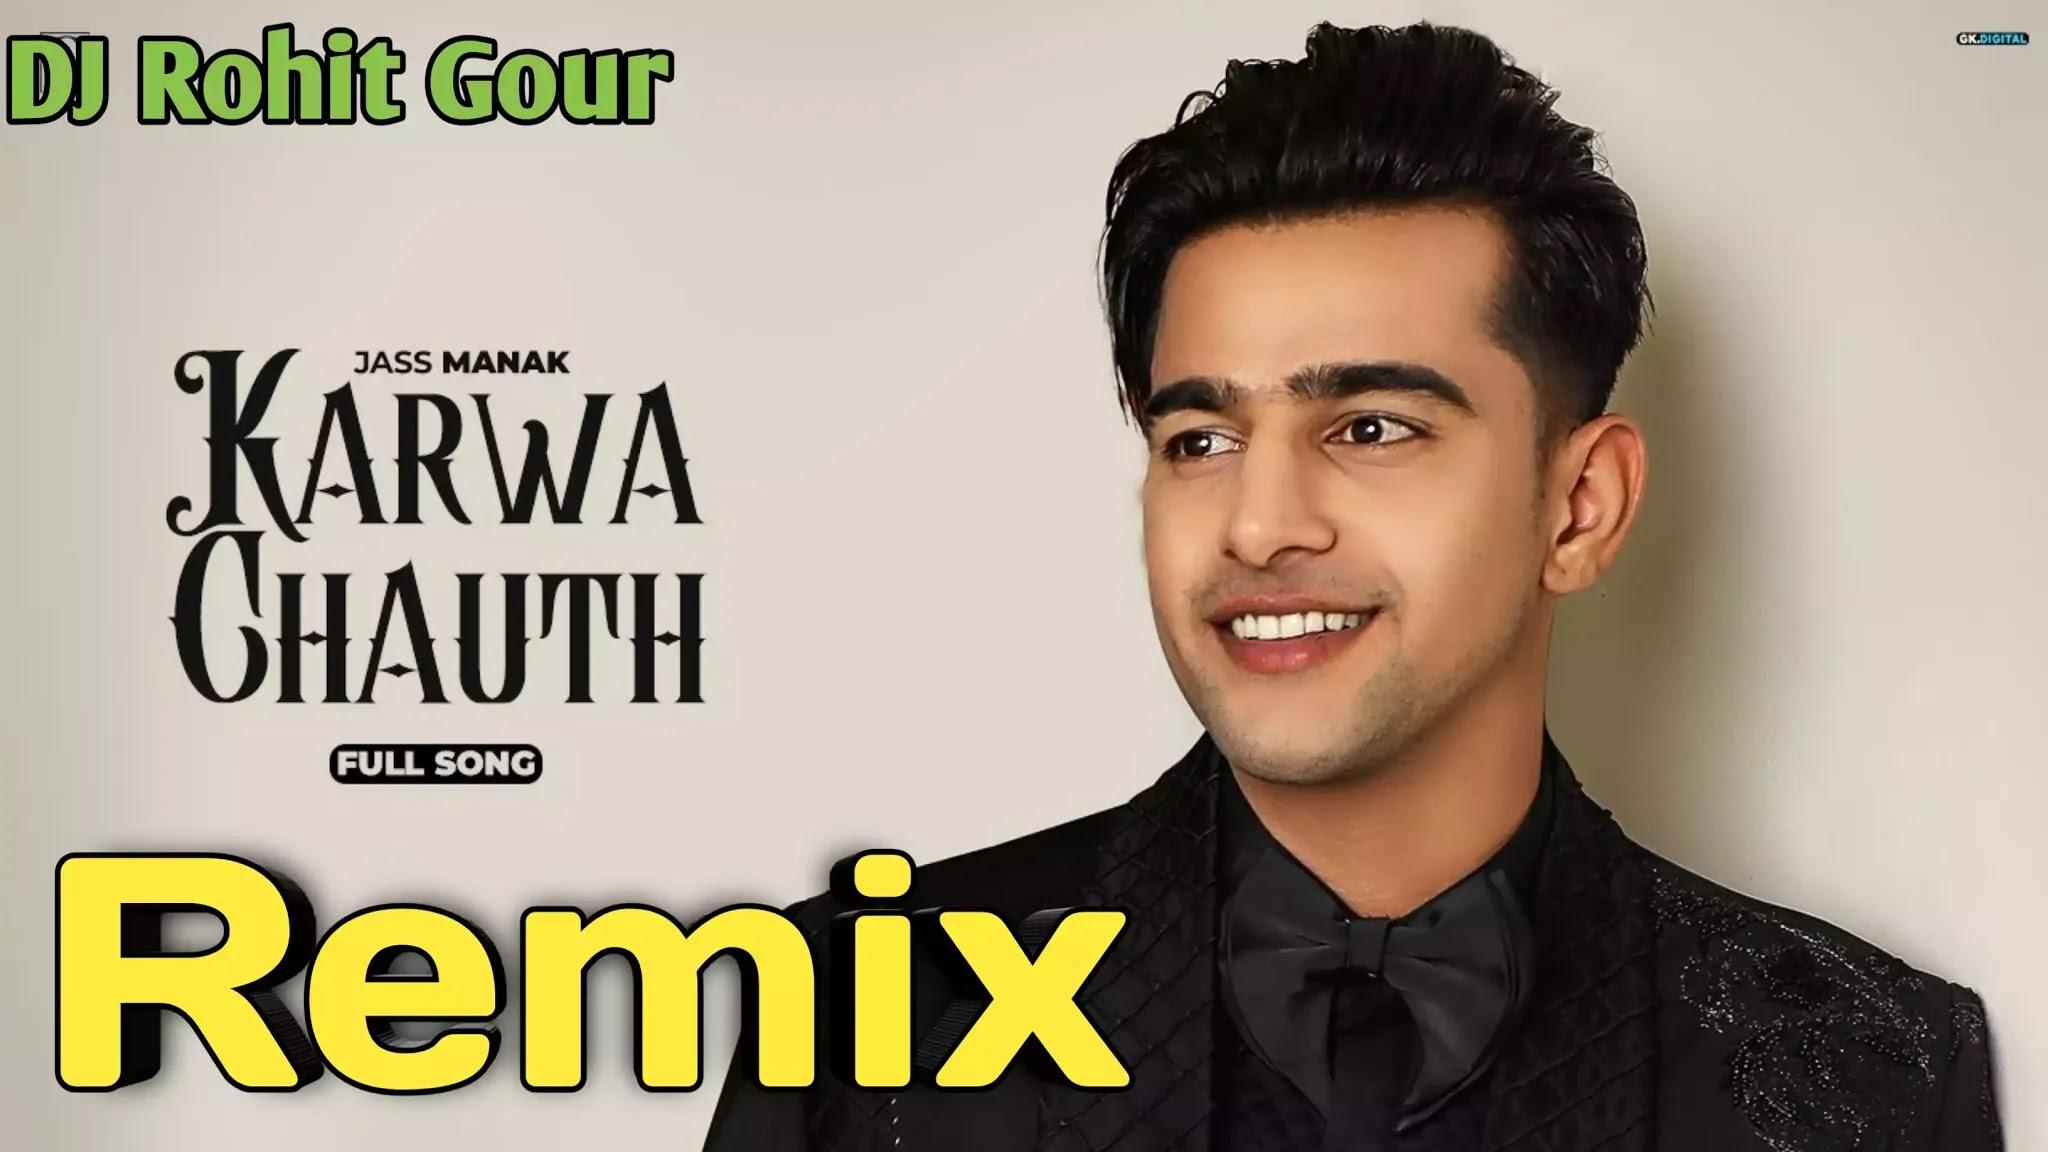 Karwa Chauth Mp3 song